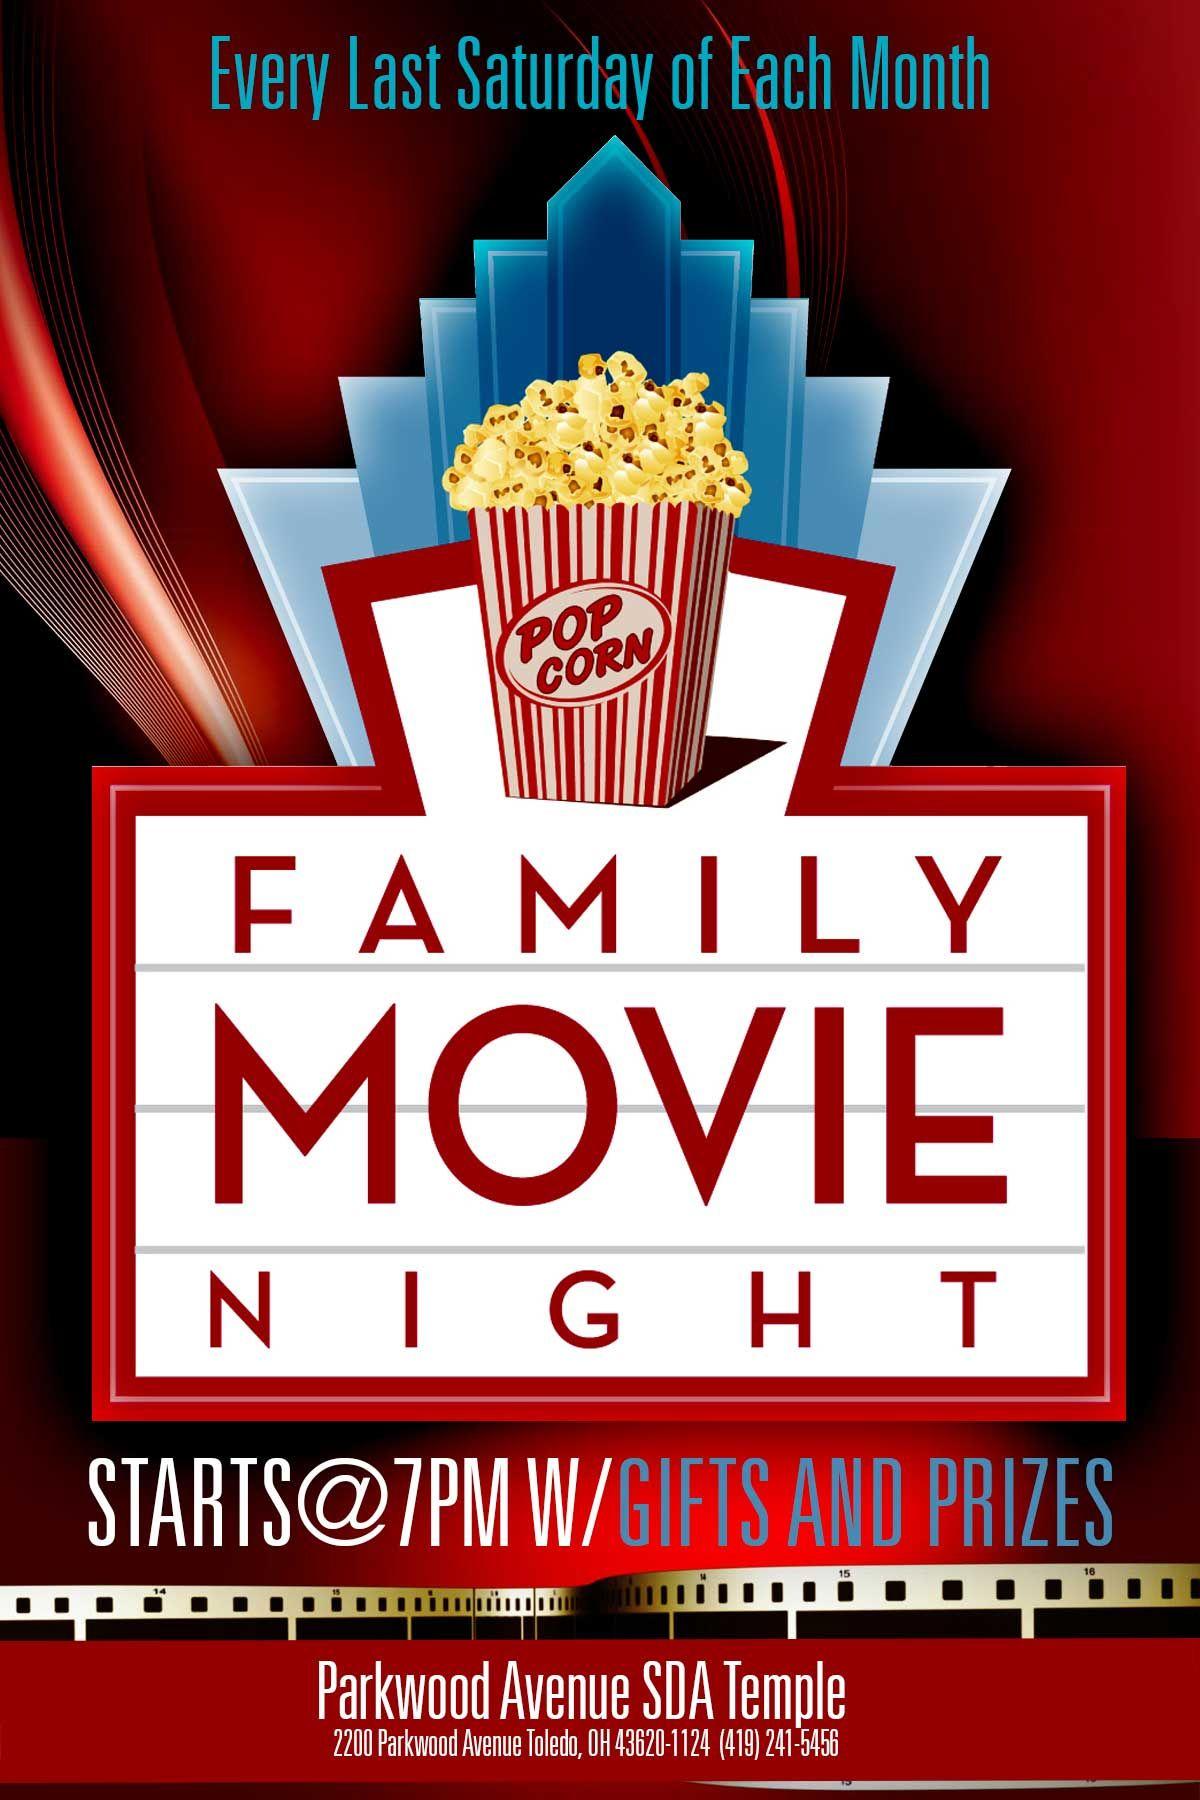 033 Movie Flyer Template Free Night Unusual Ideas Family